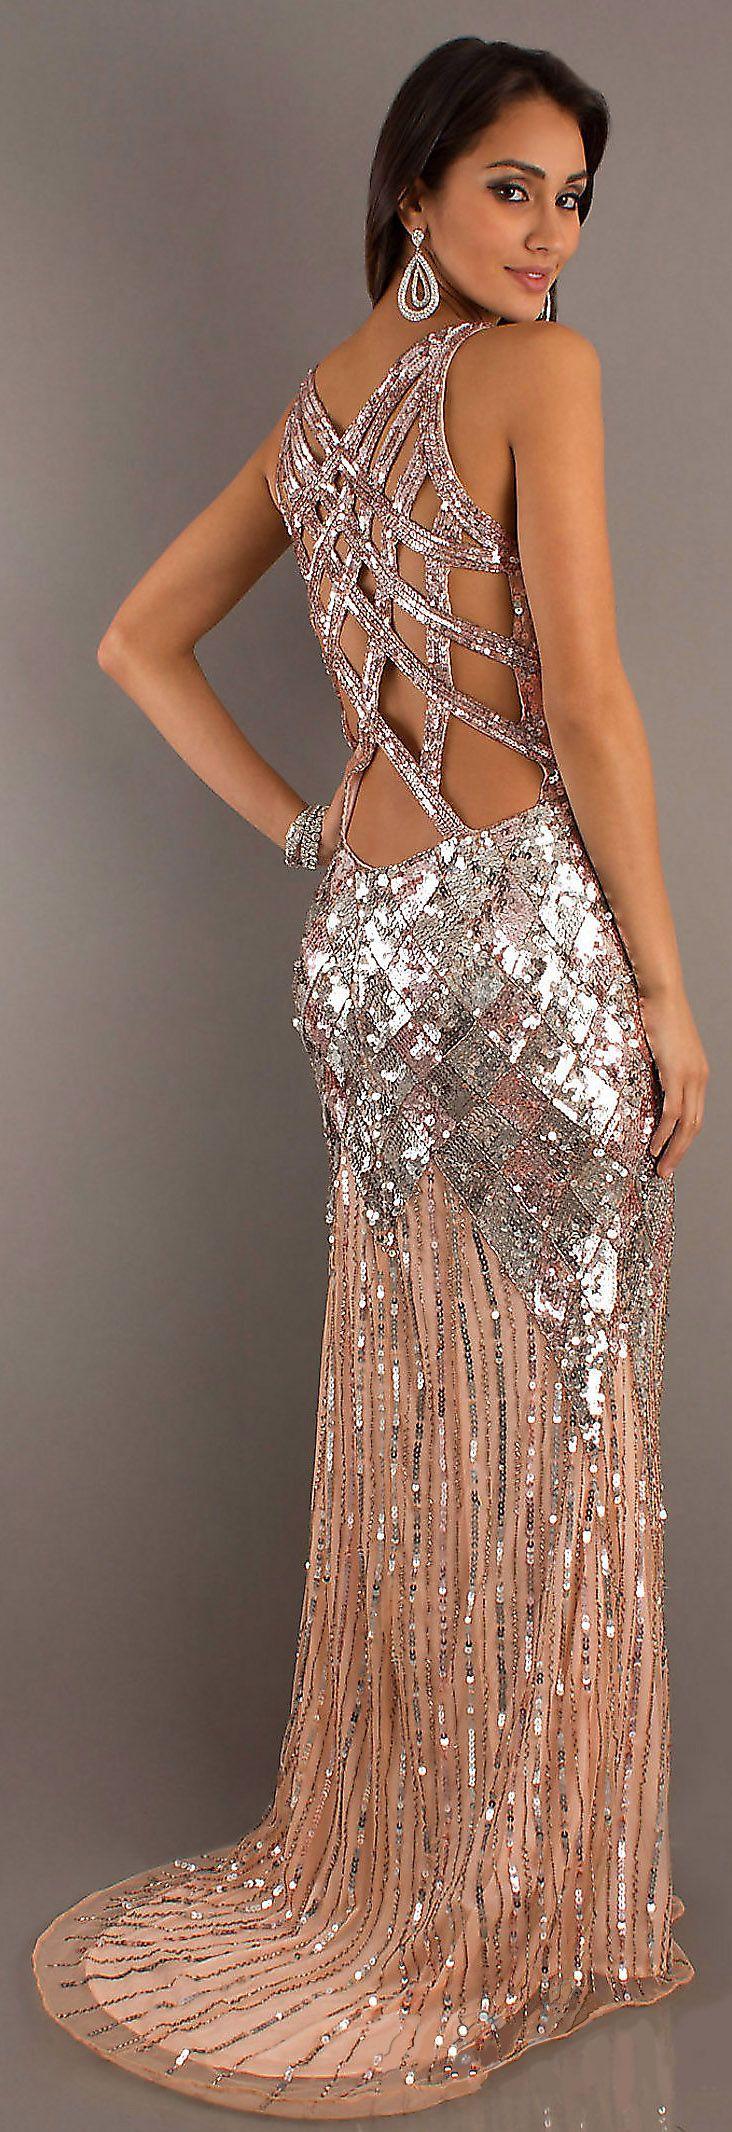 Long vneck sequin formal dress by primavera fashion pinterest